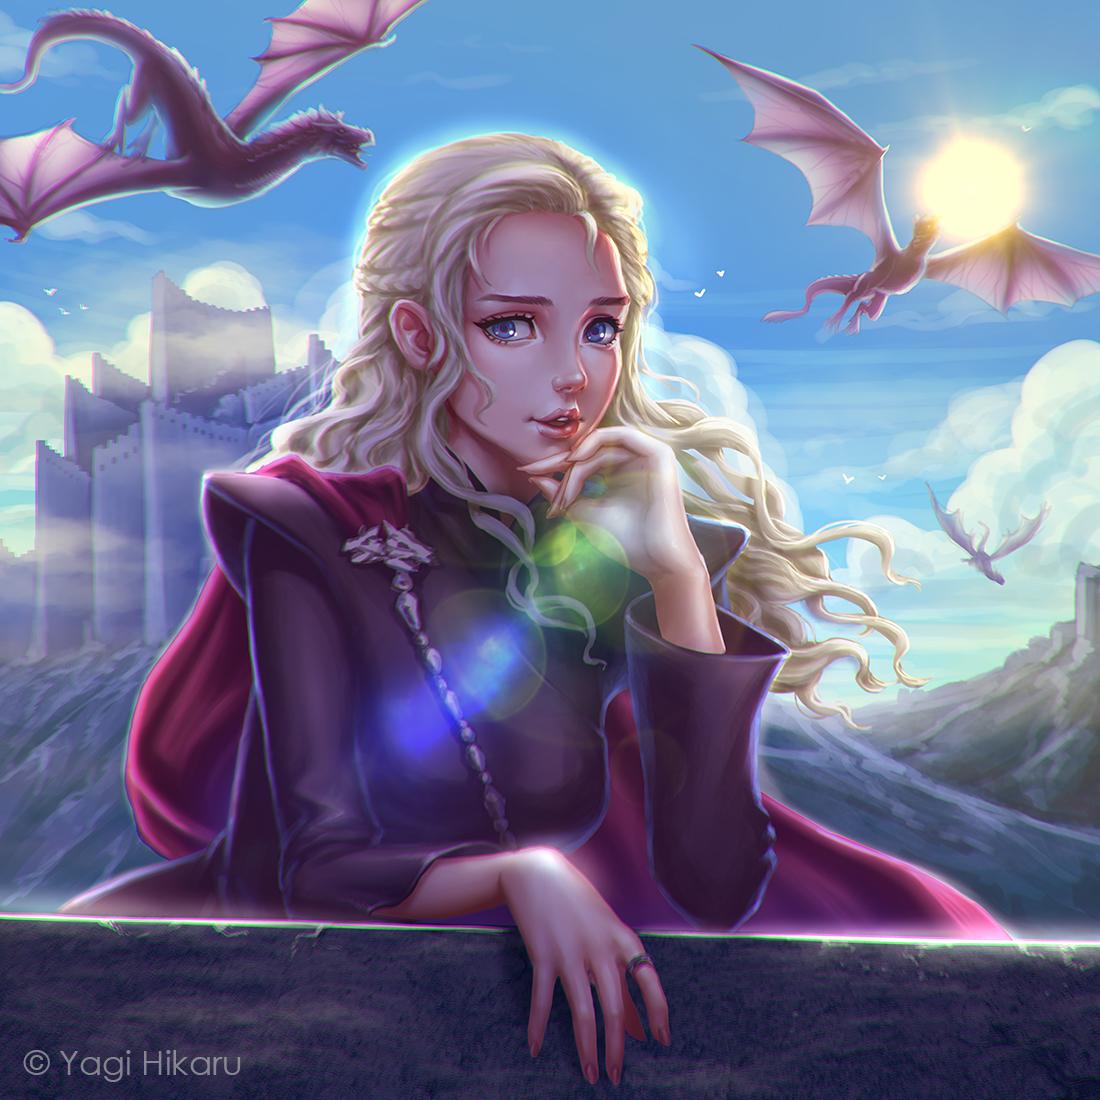 Фото Дейенерис Таргариен / Daenerys Targaryen из сериала Игра престолов / Game of Thrones, by yagihikaru